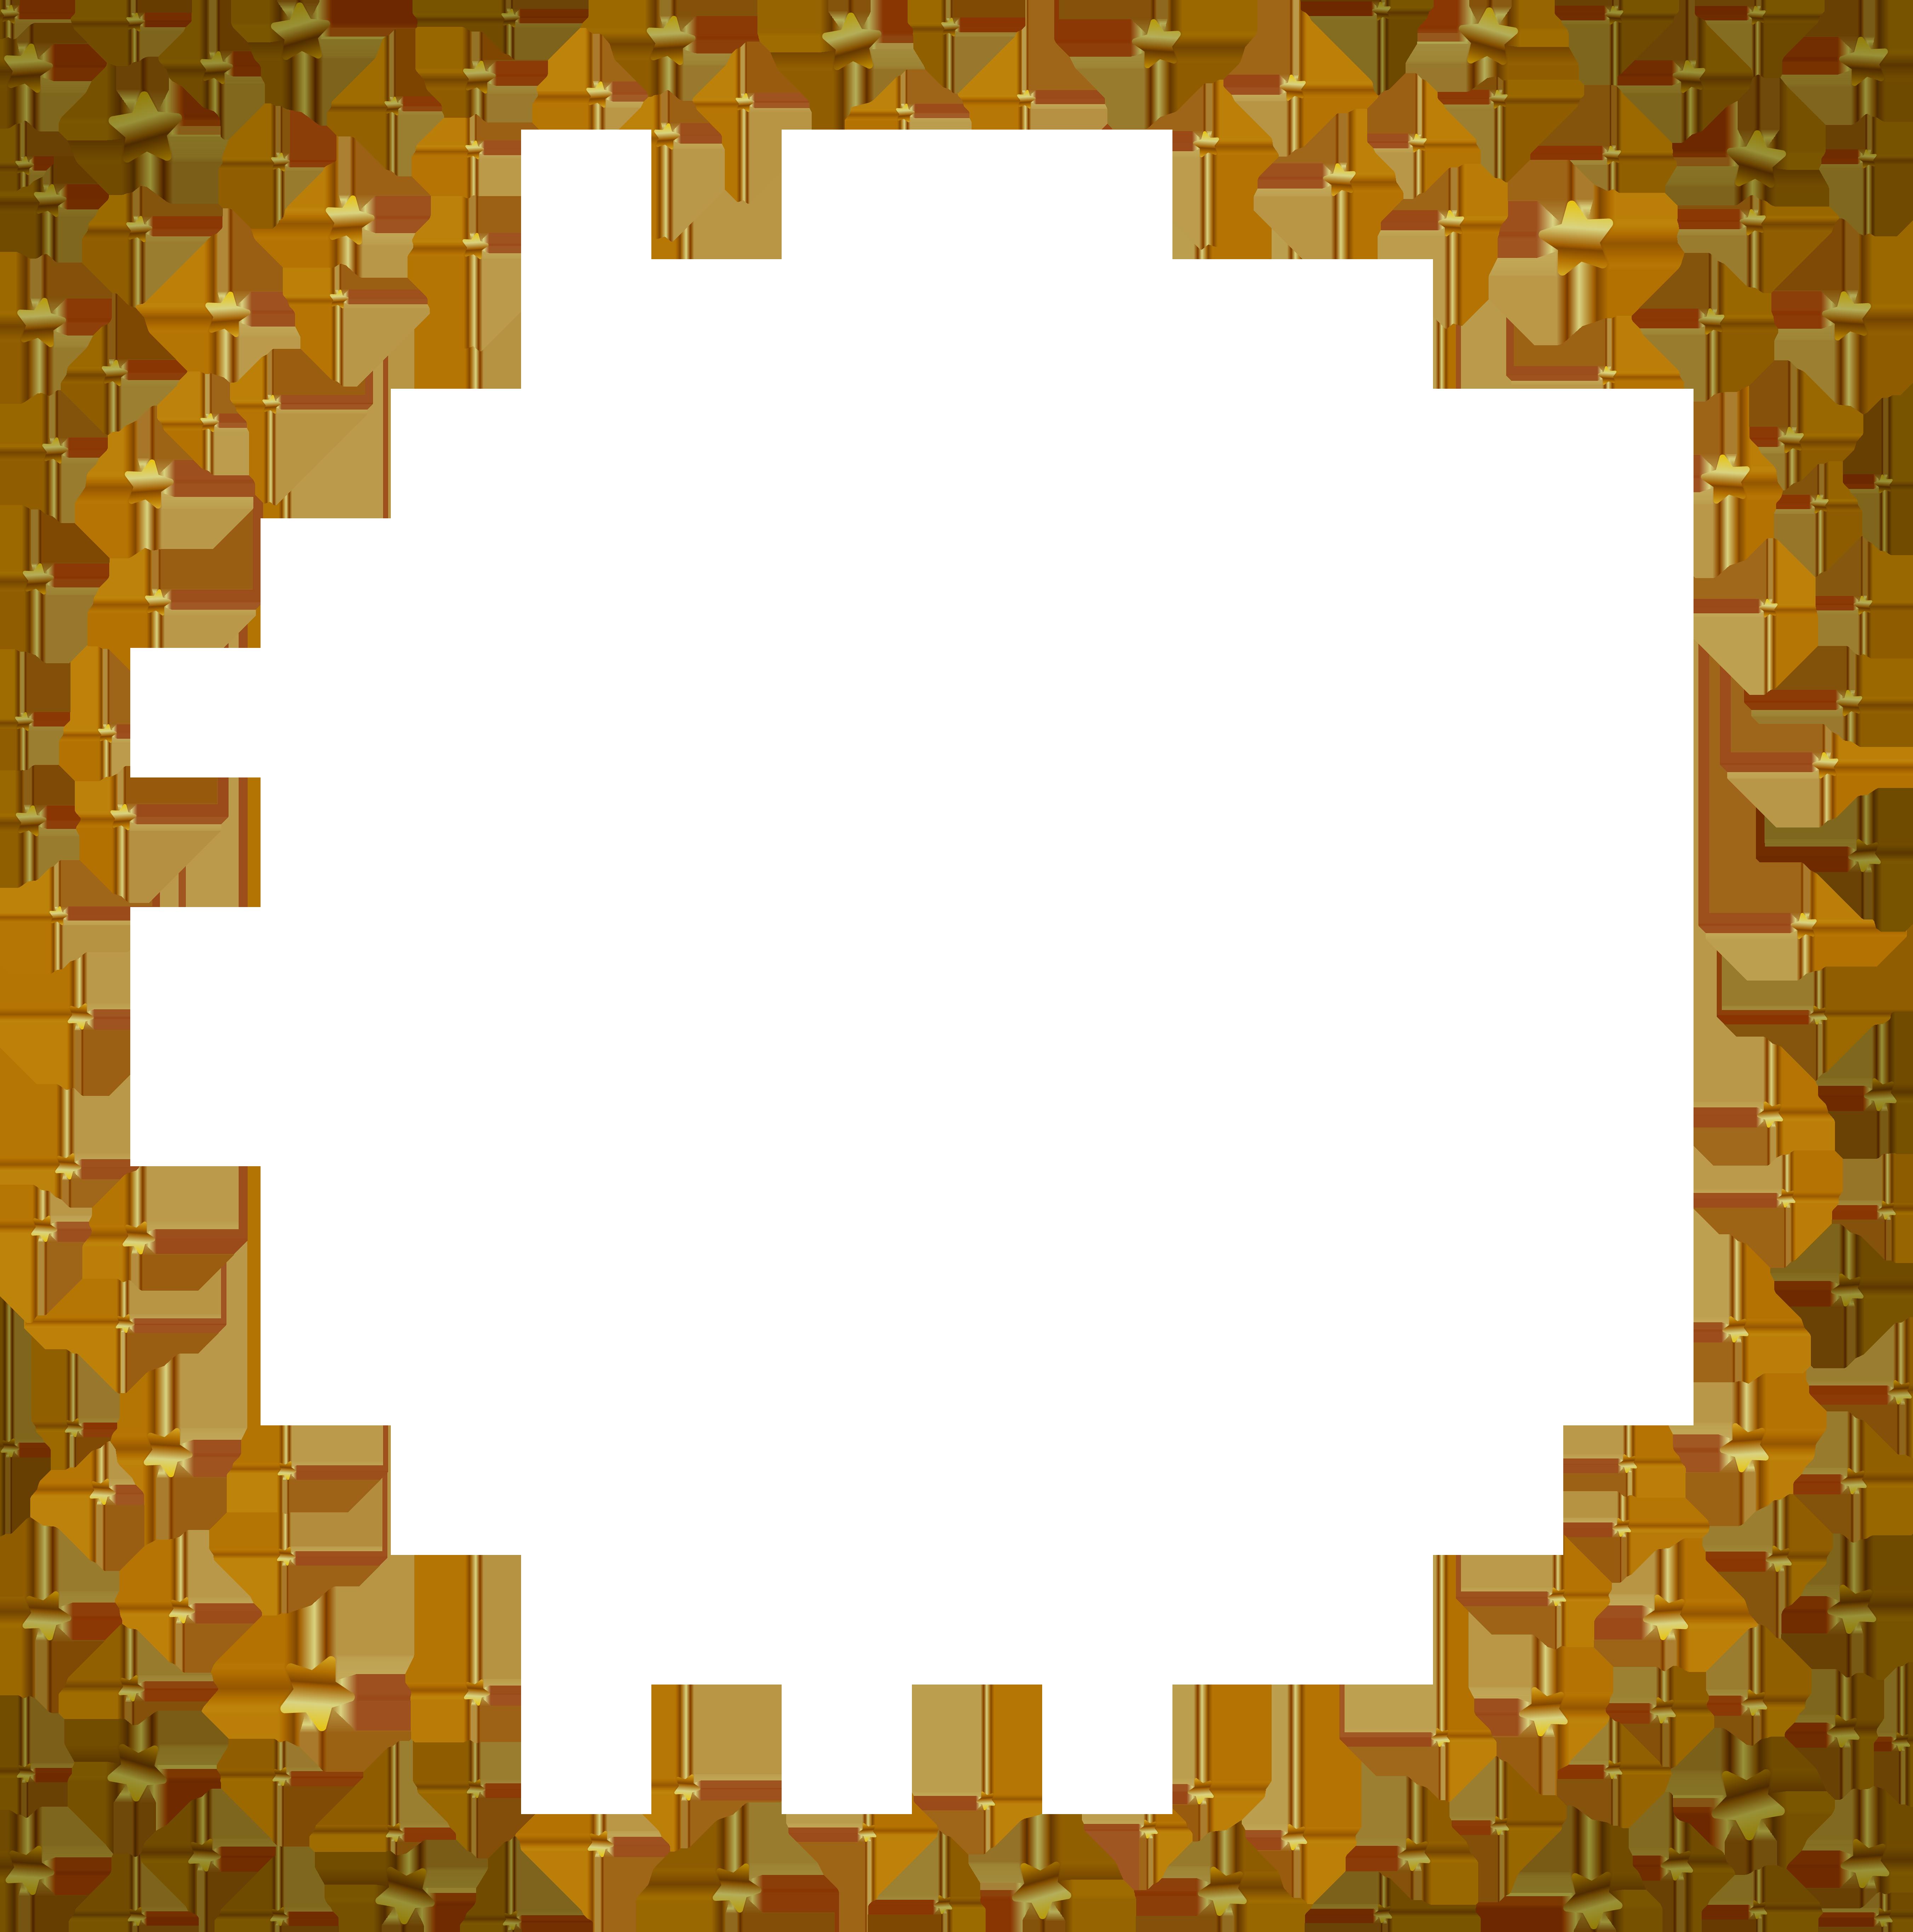 Google images motif pattern. Star border png